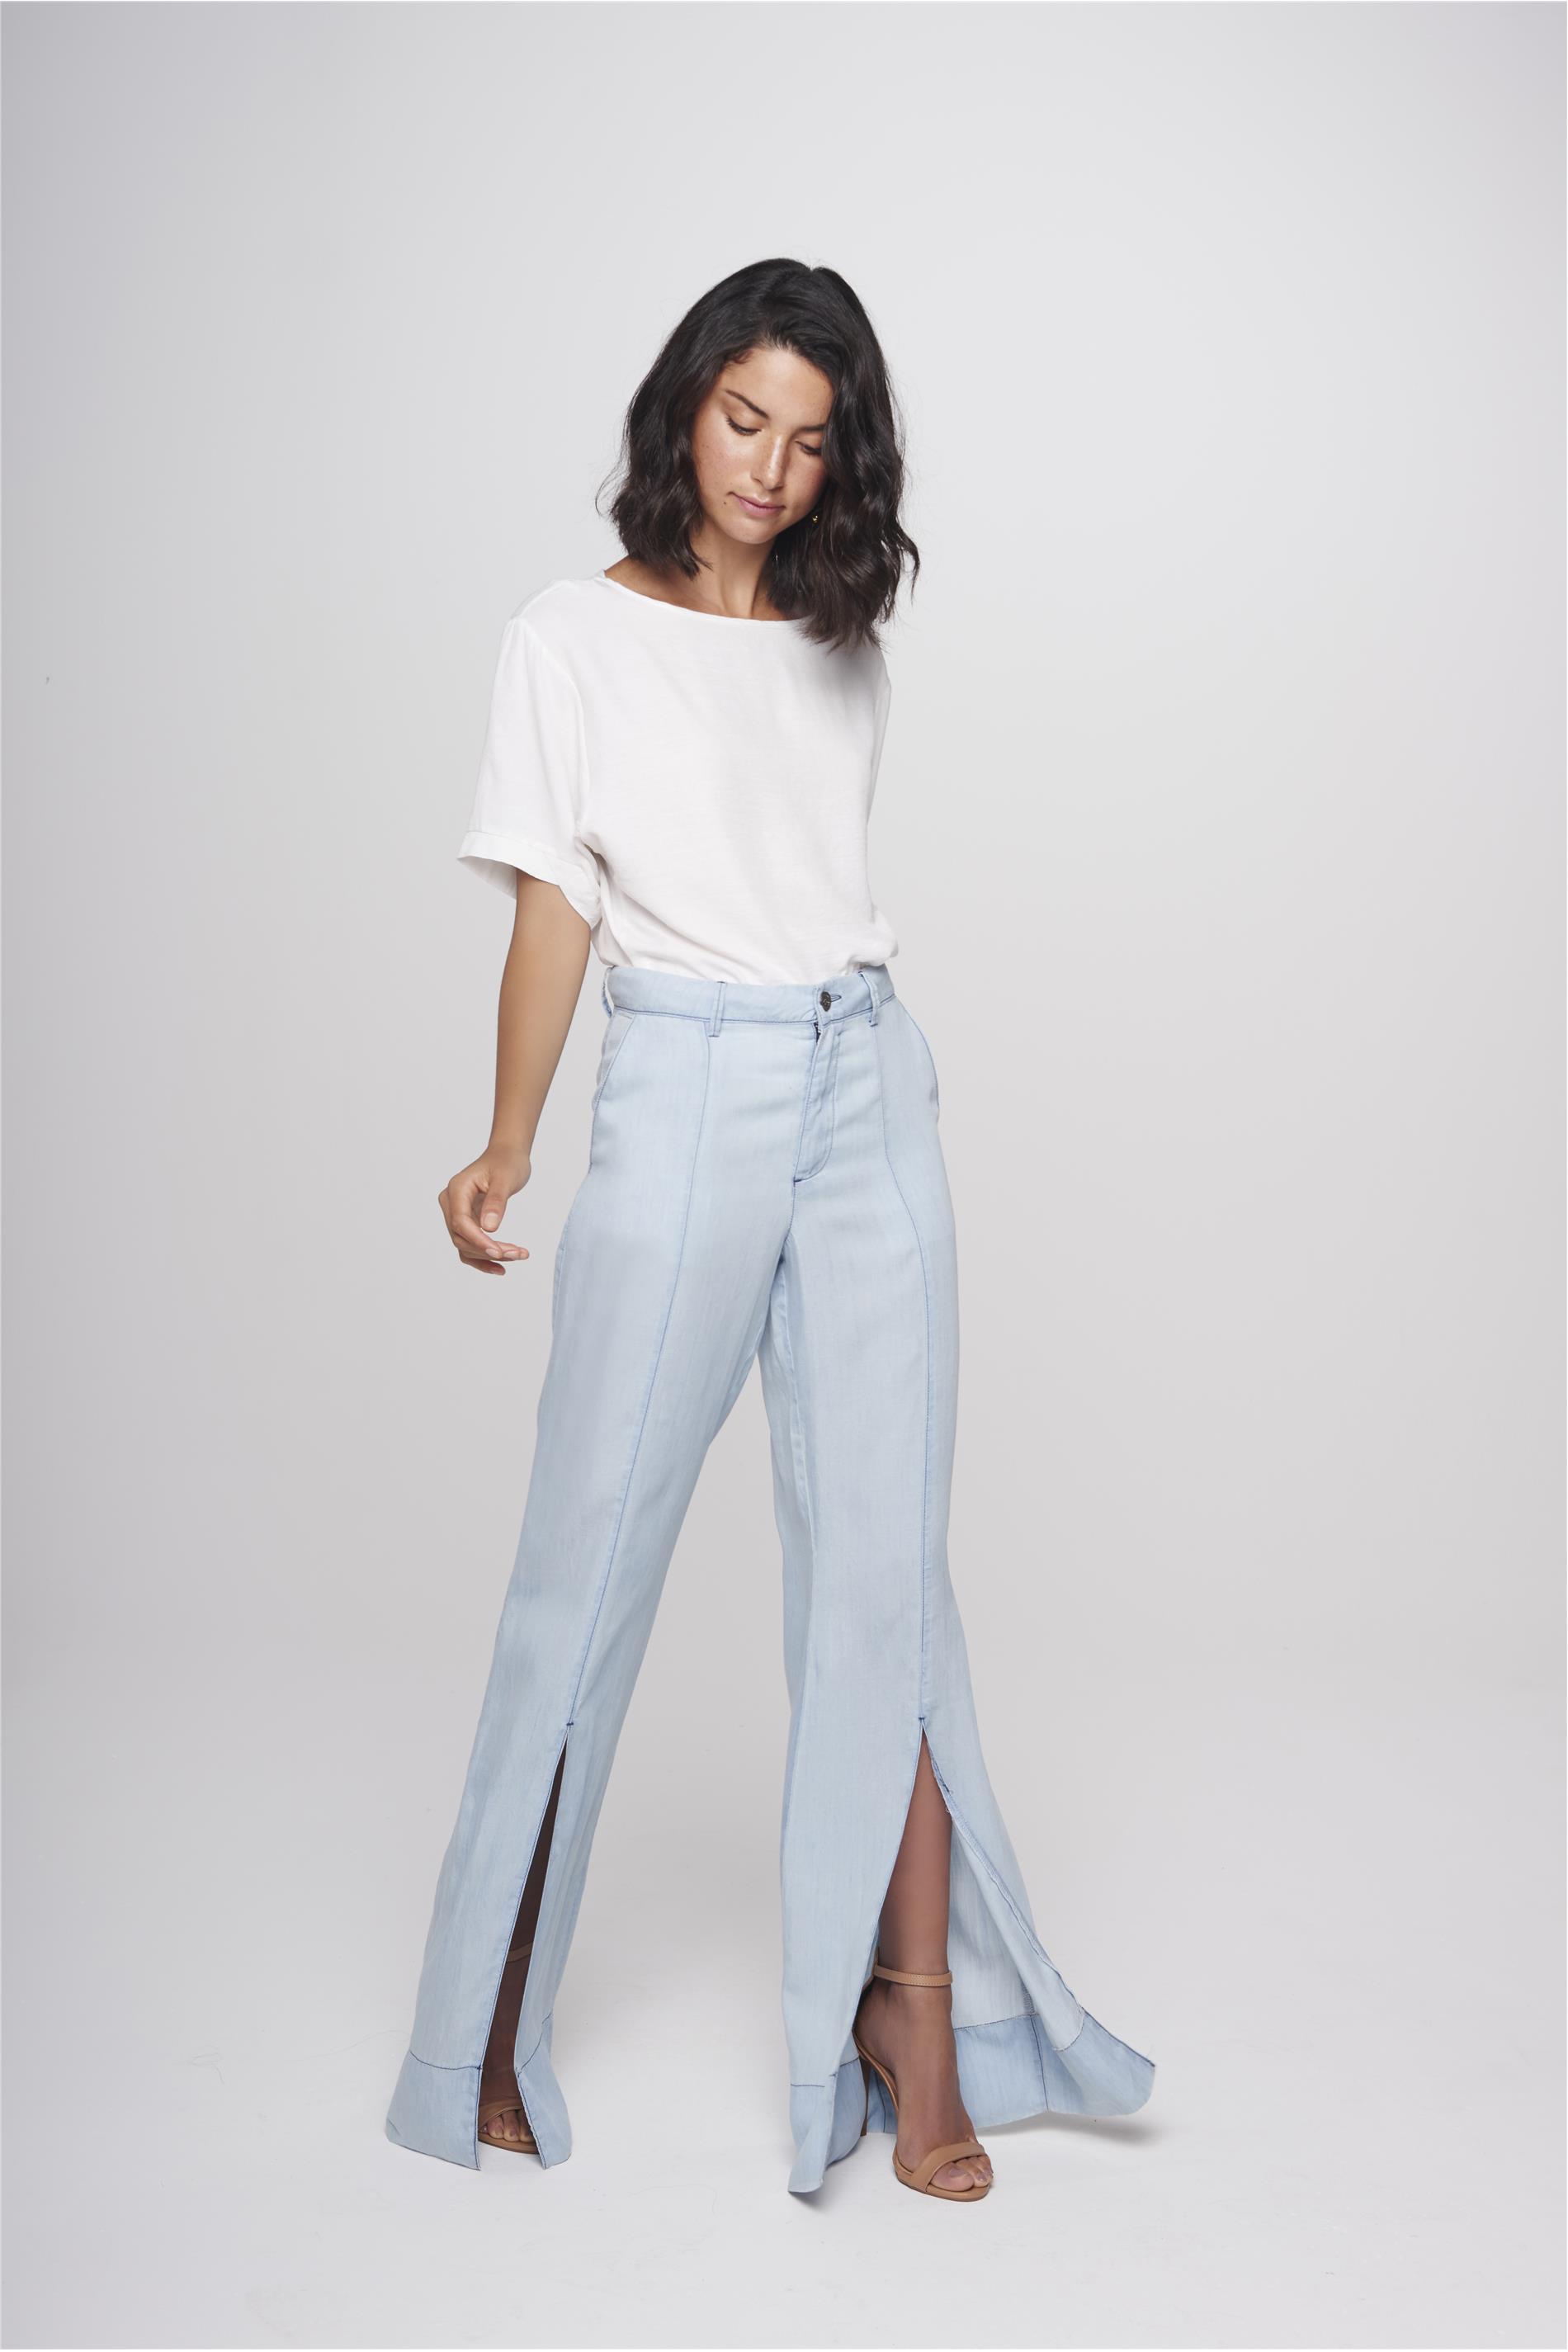 d177043eb Calça Flare Jeans Feminina Fenda Barra - Damyller